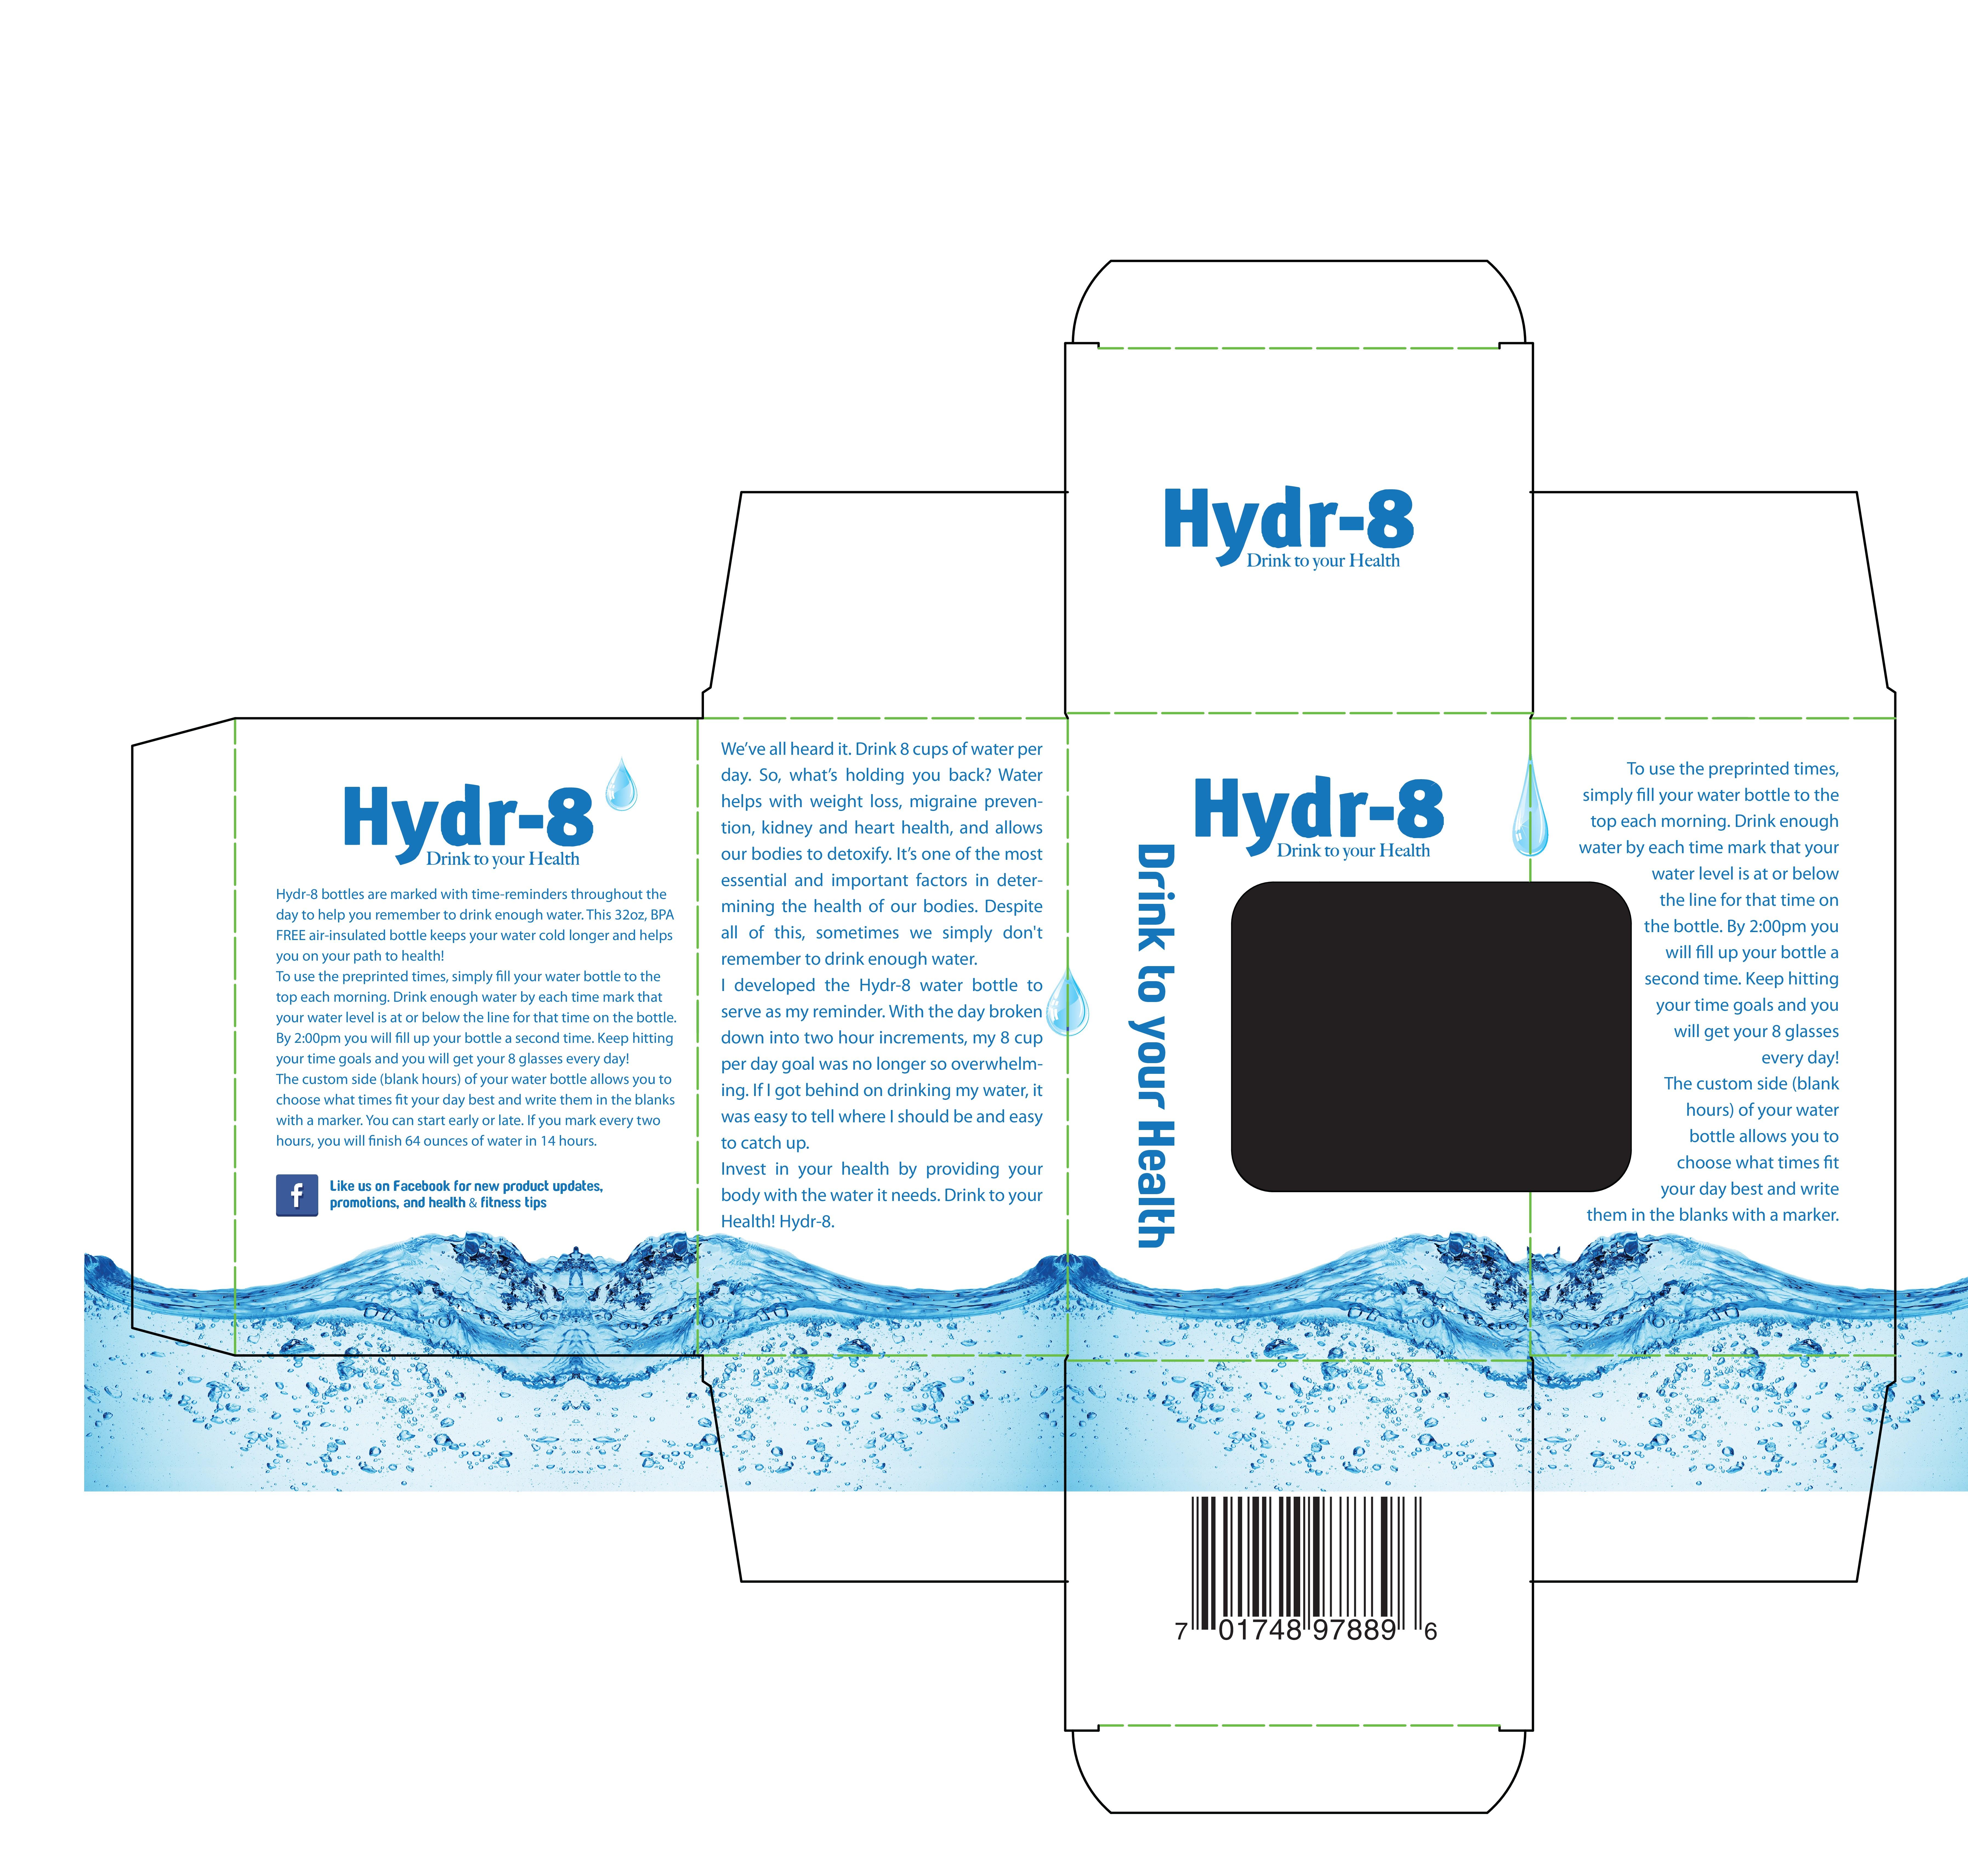 Hydr-8 Water Bottles Retail Box